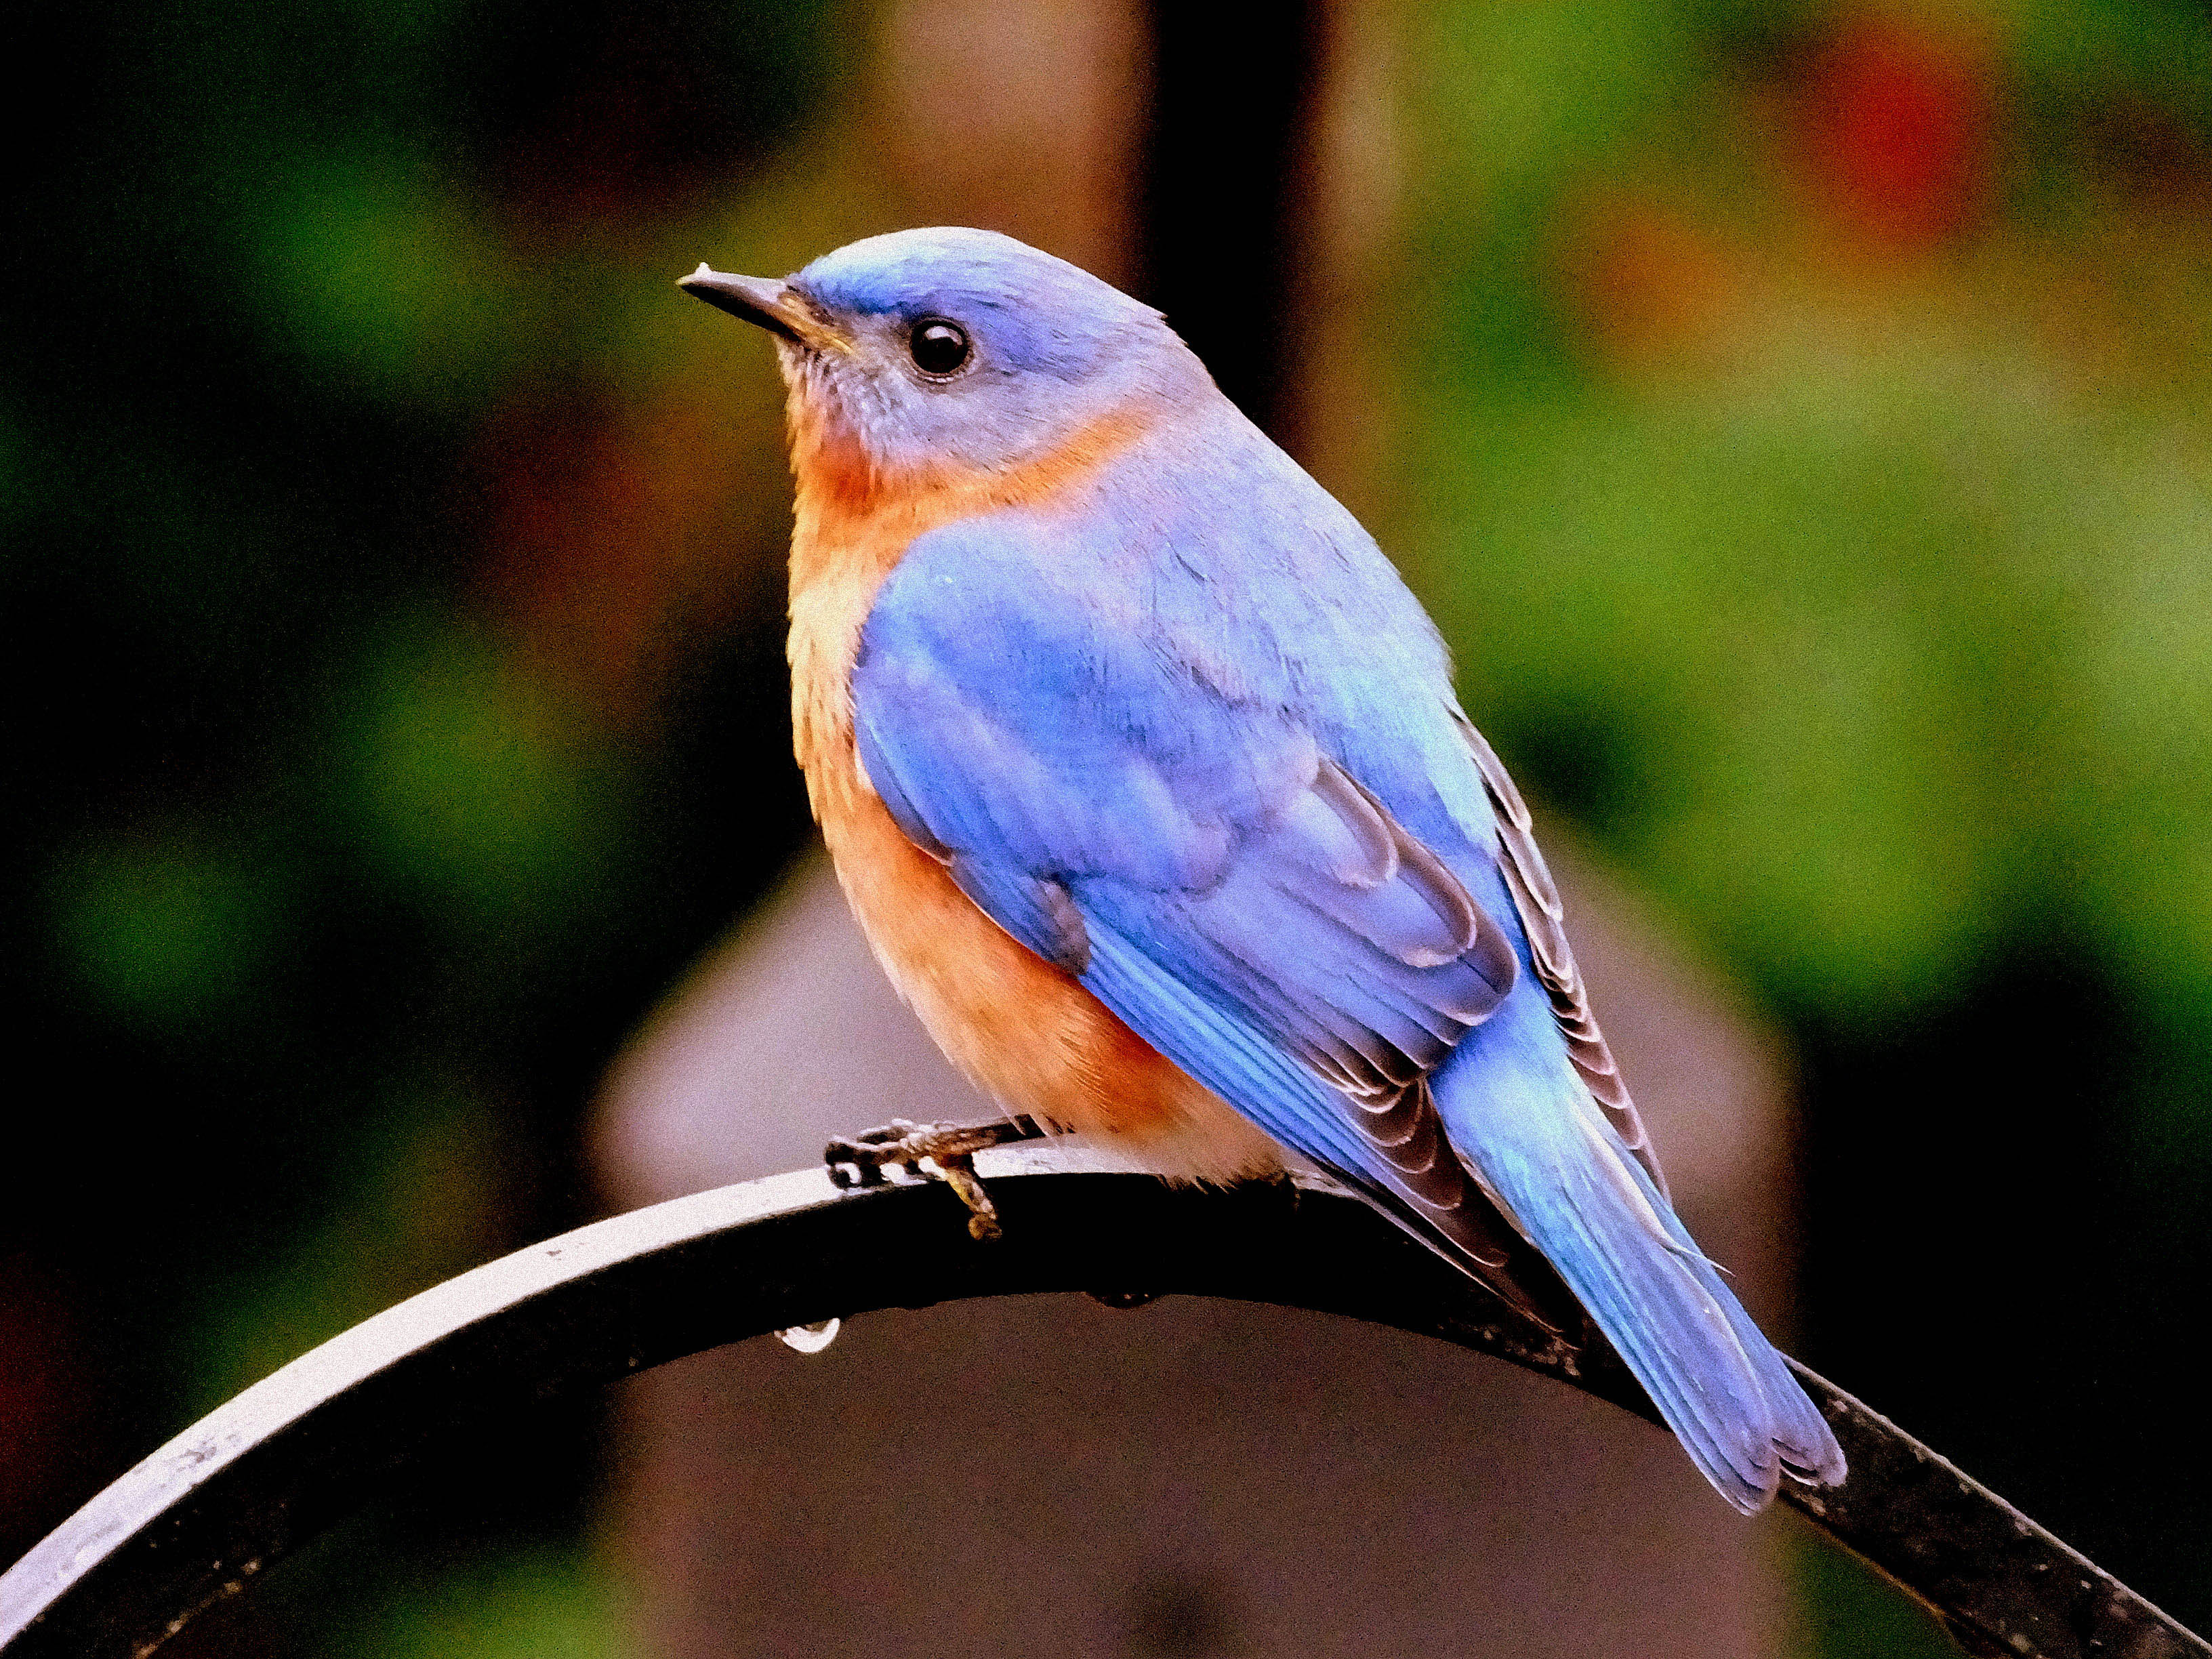 birds_parsons_gw_02jpg